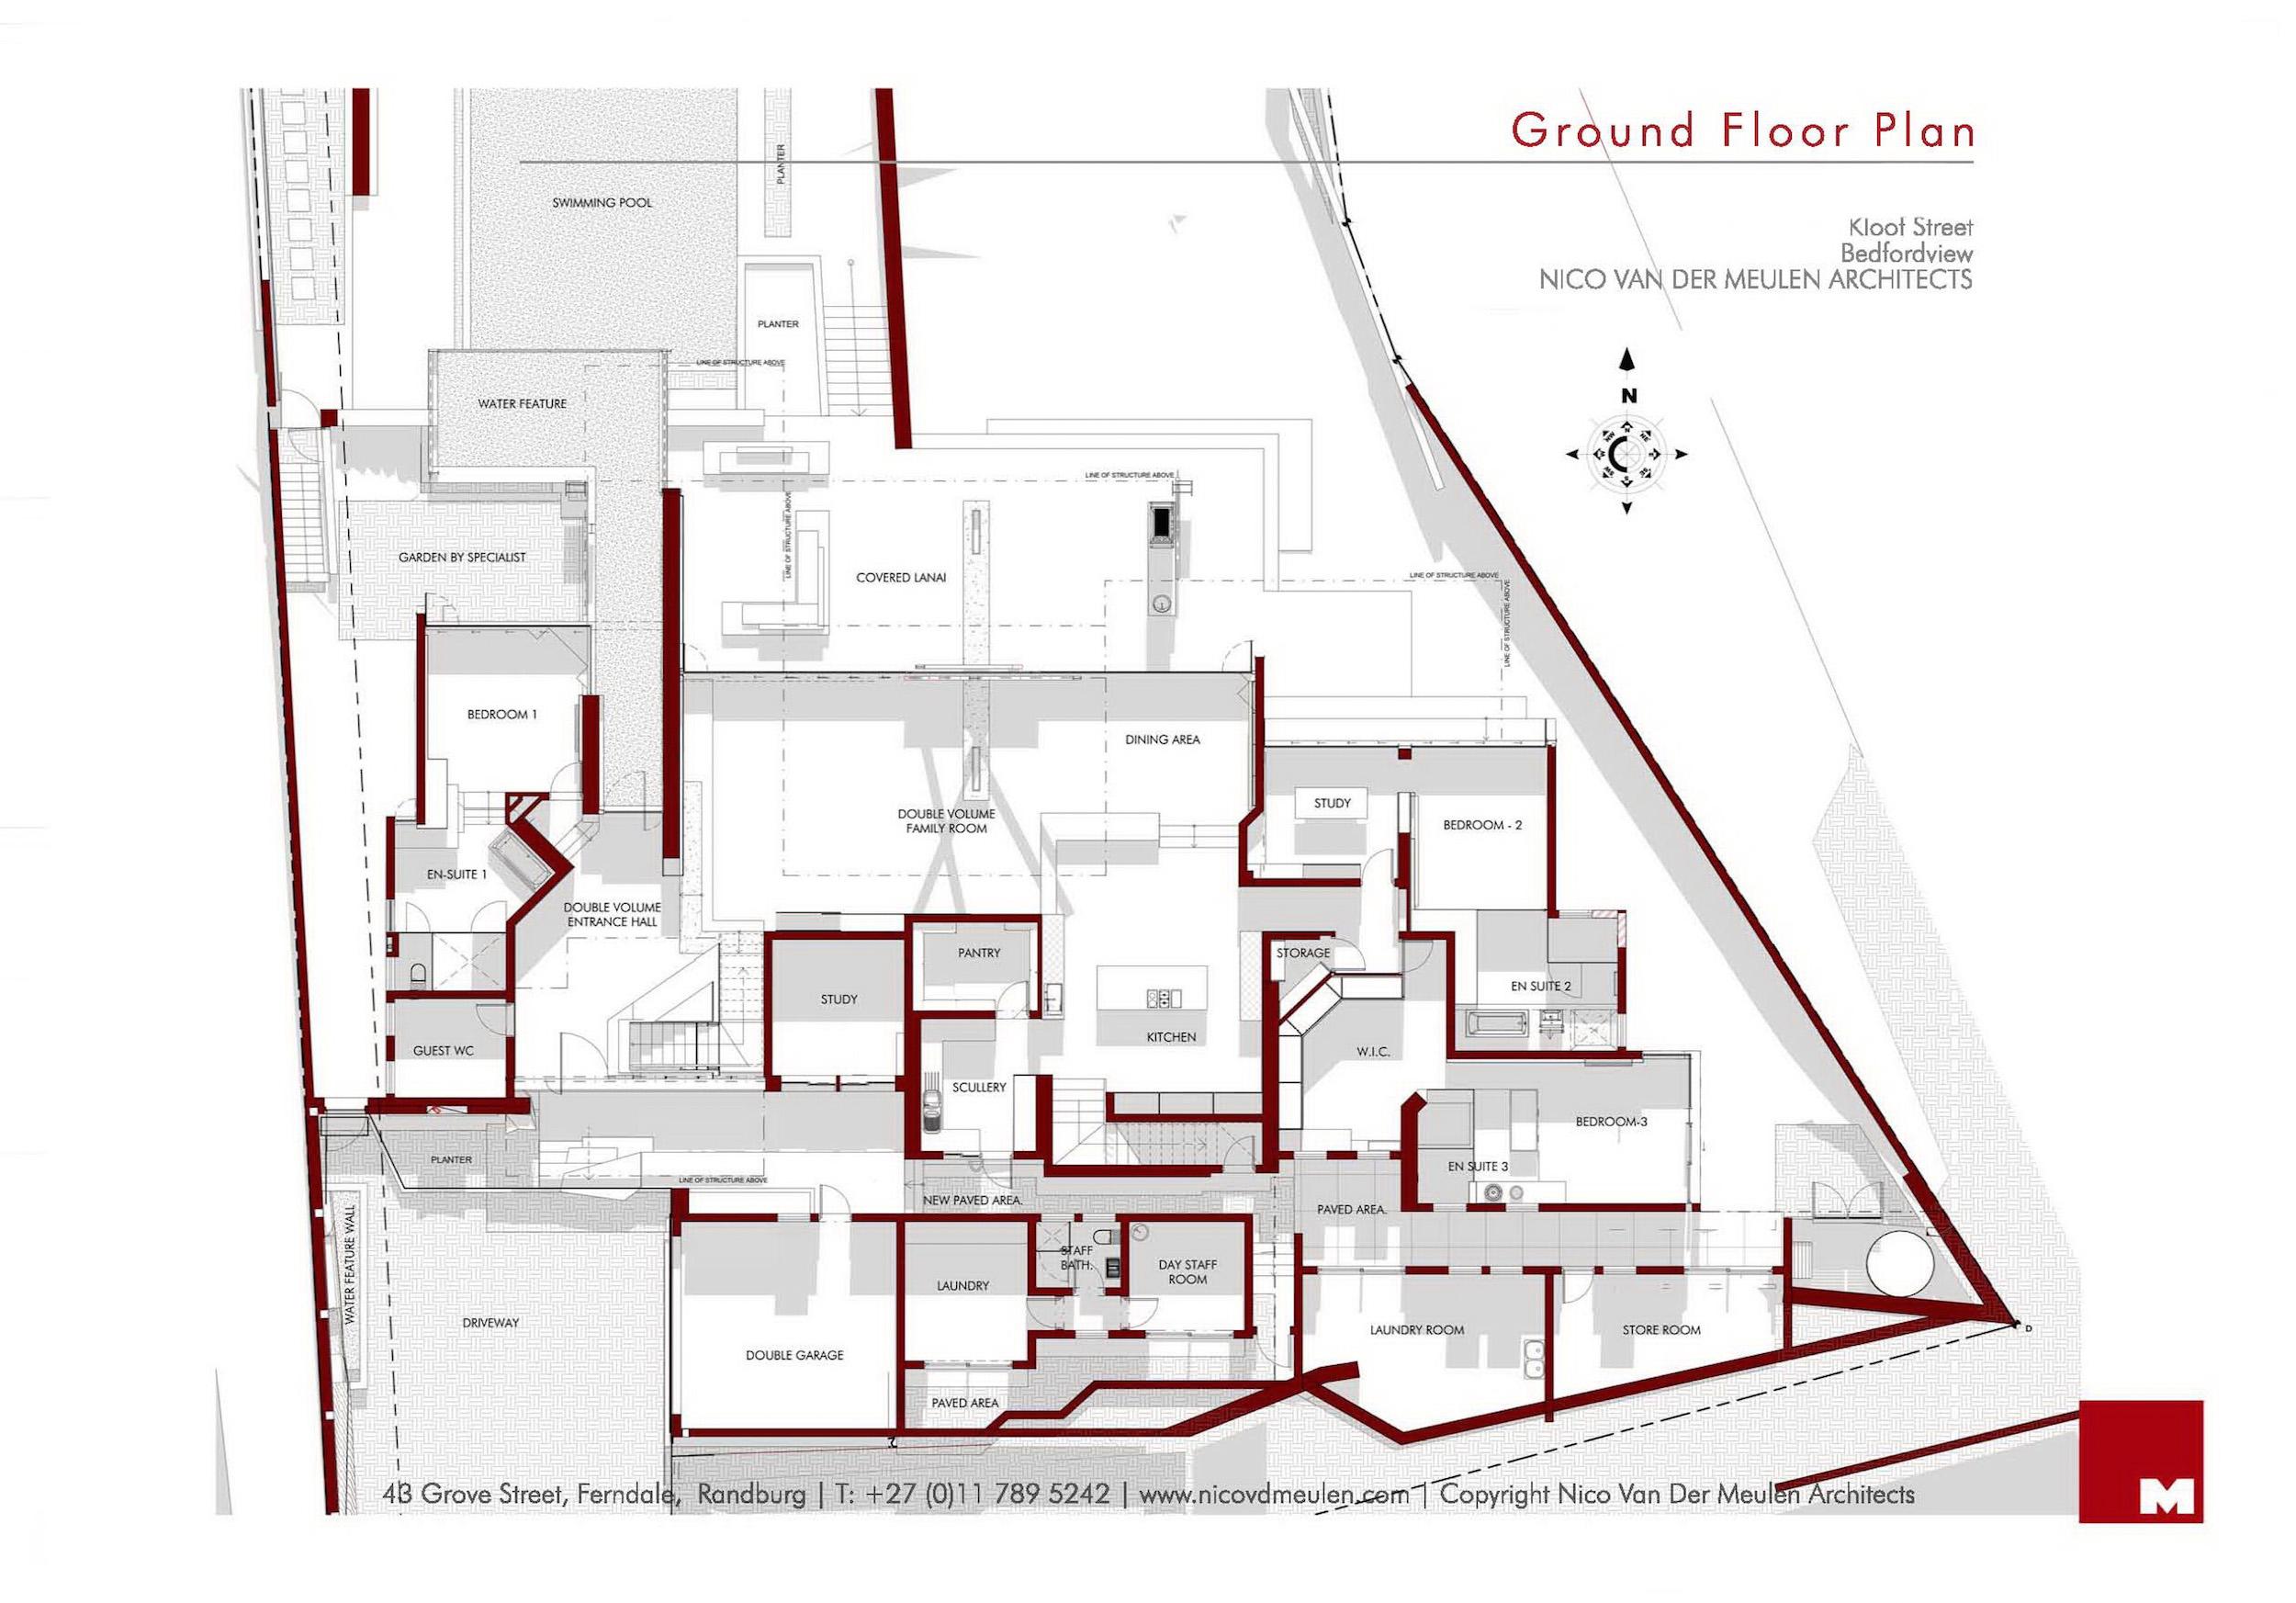 Kloof Road Masterpiece House in Johannesburg by Nico van der Meulen Architects-40